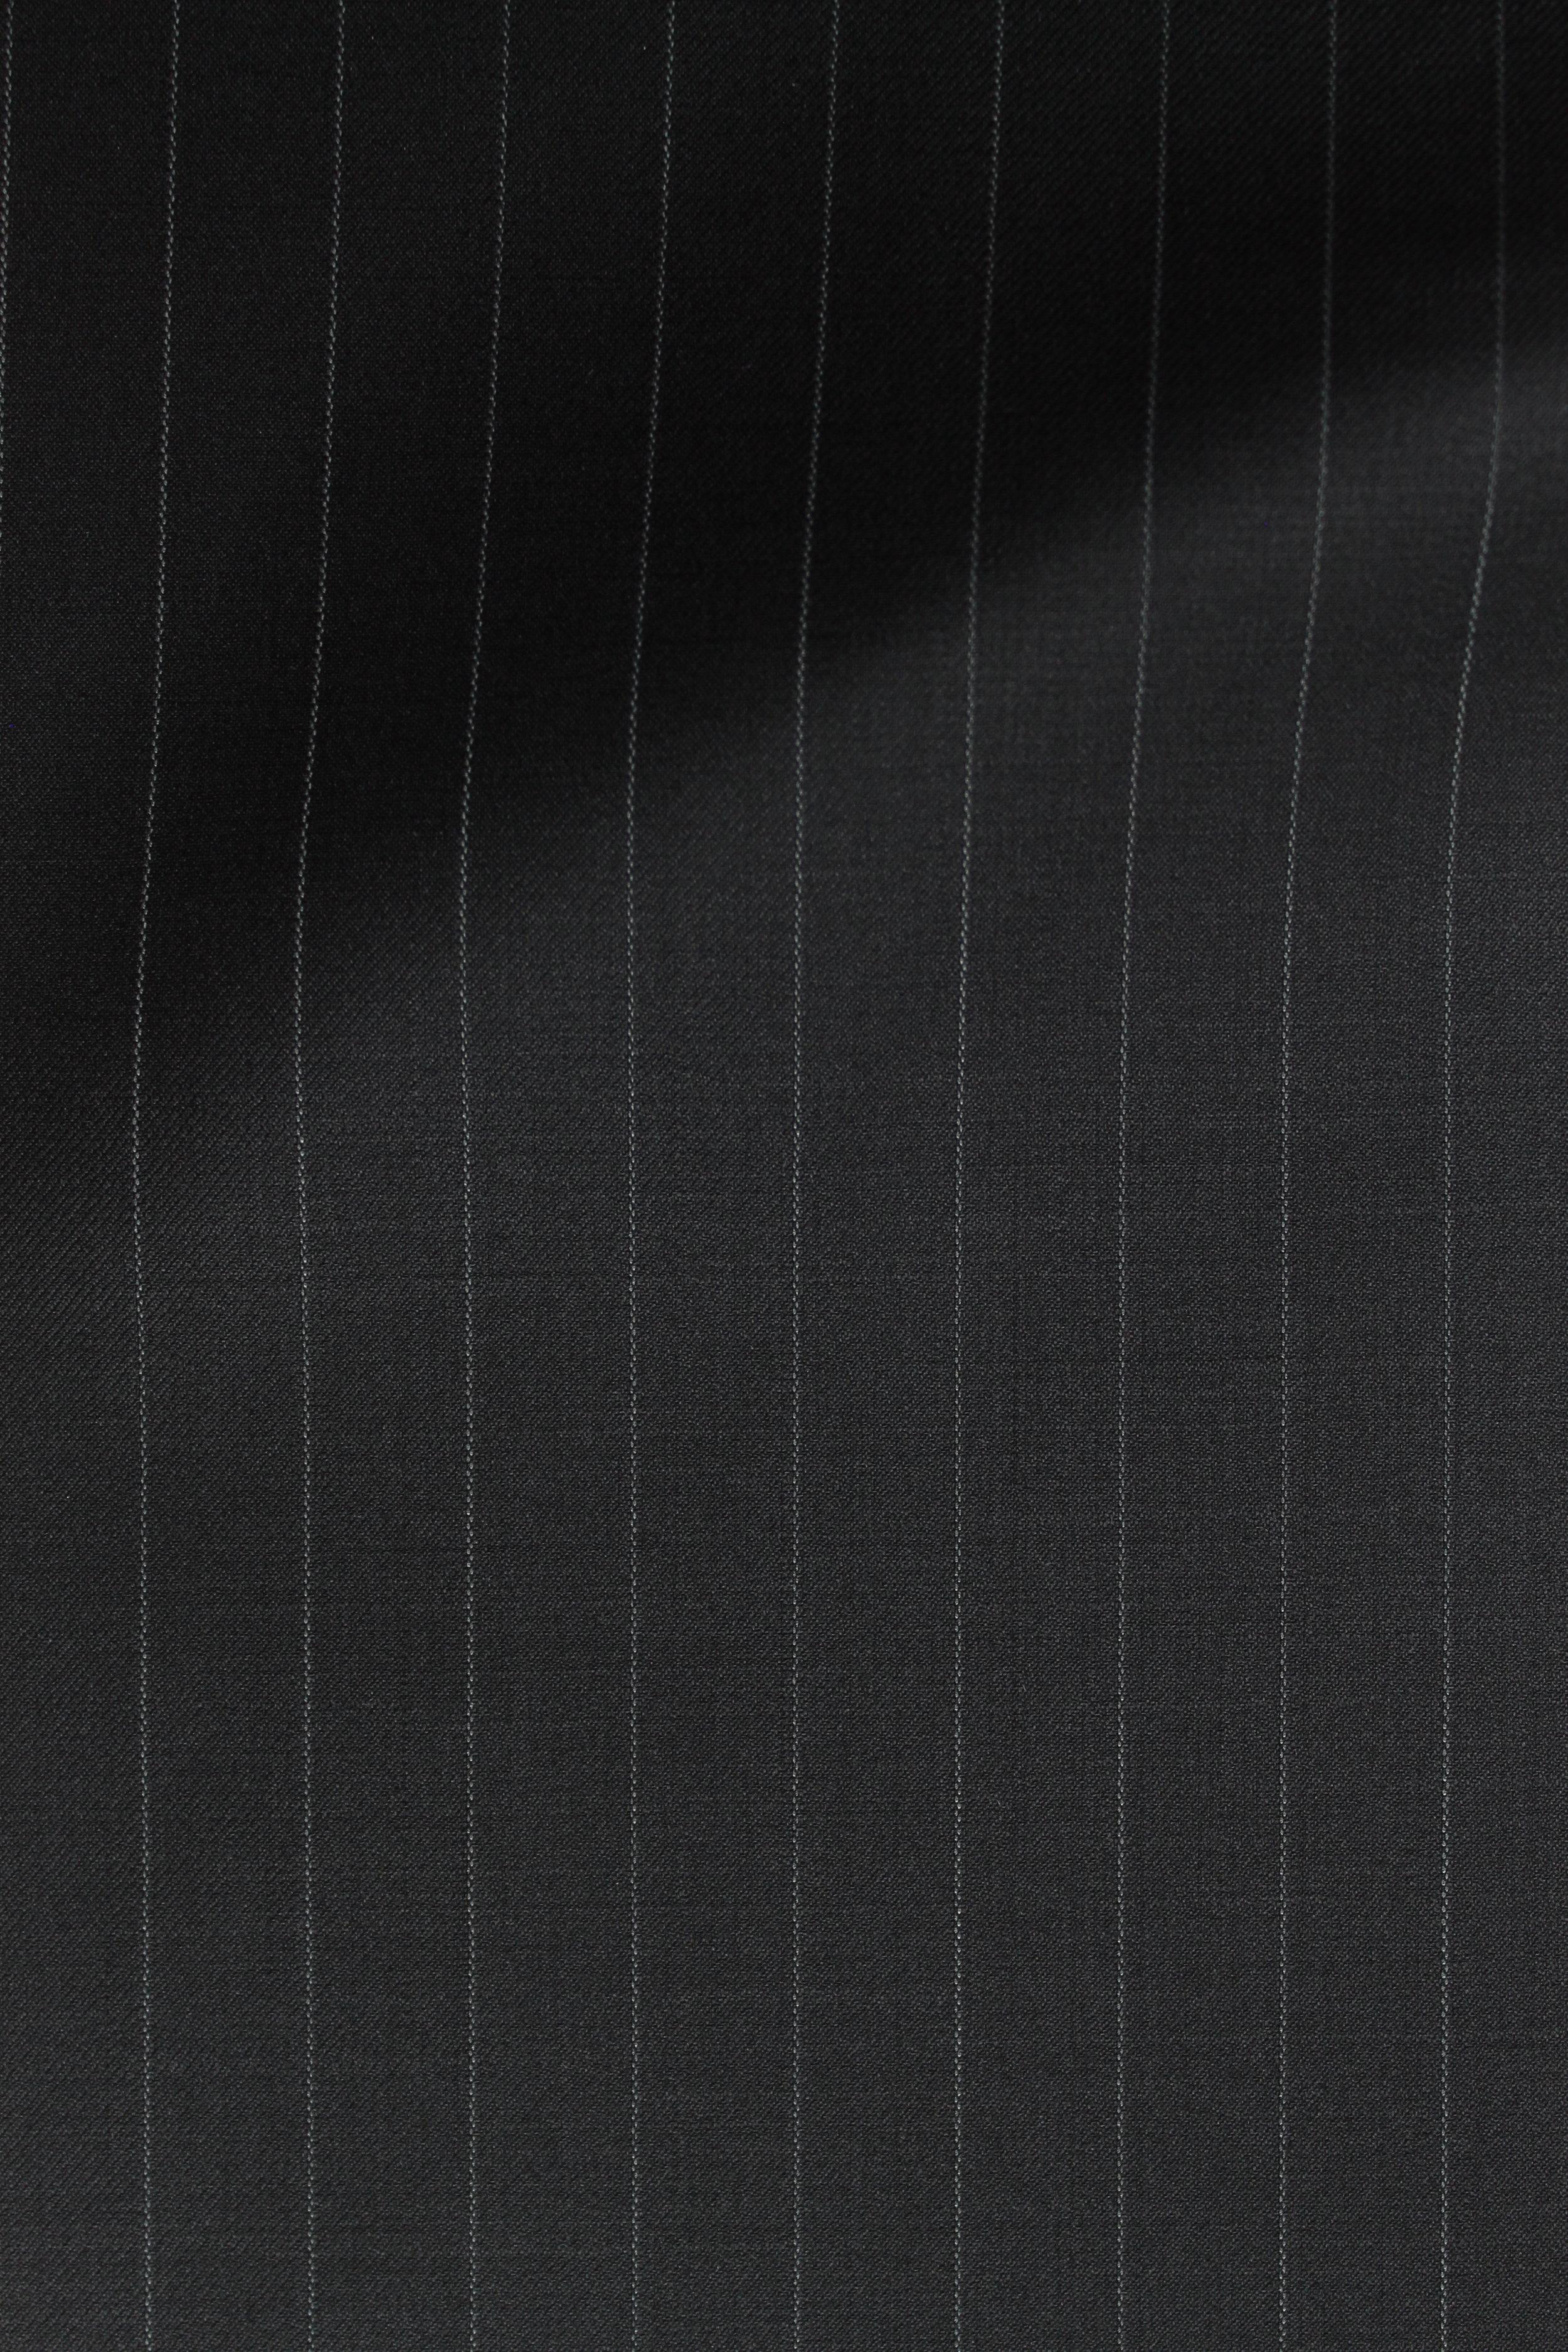 7468 Coal Half Inch Stripe 280g.JPG